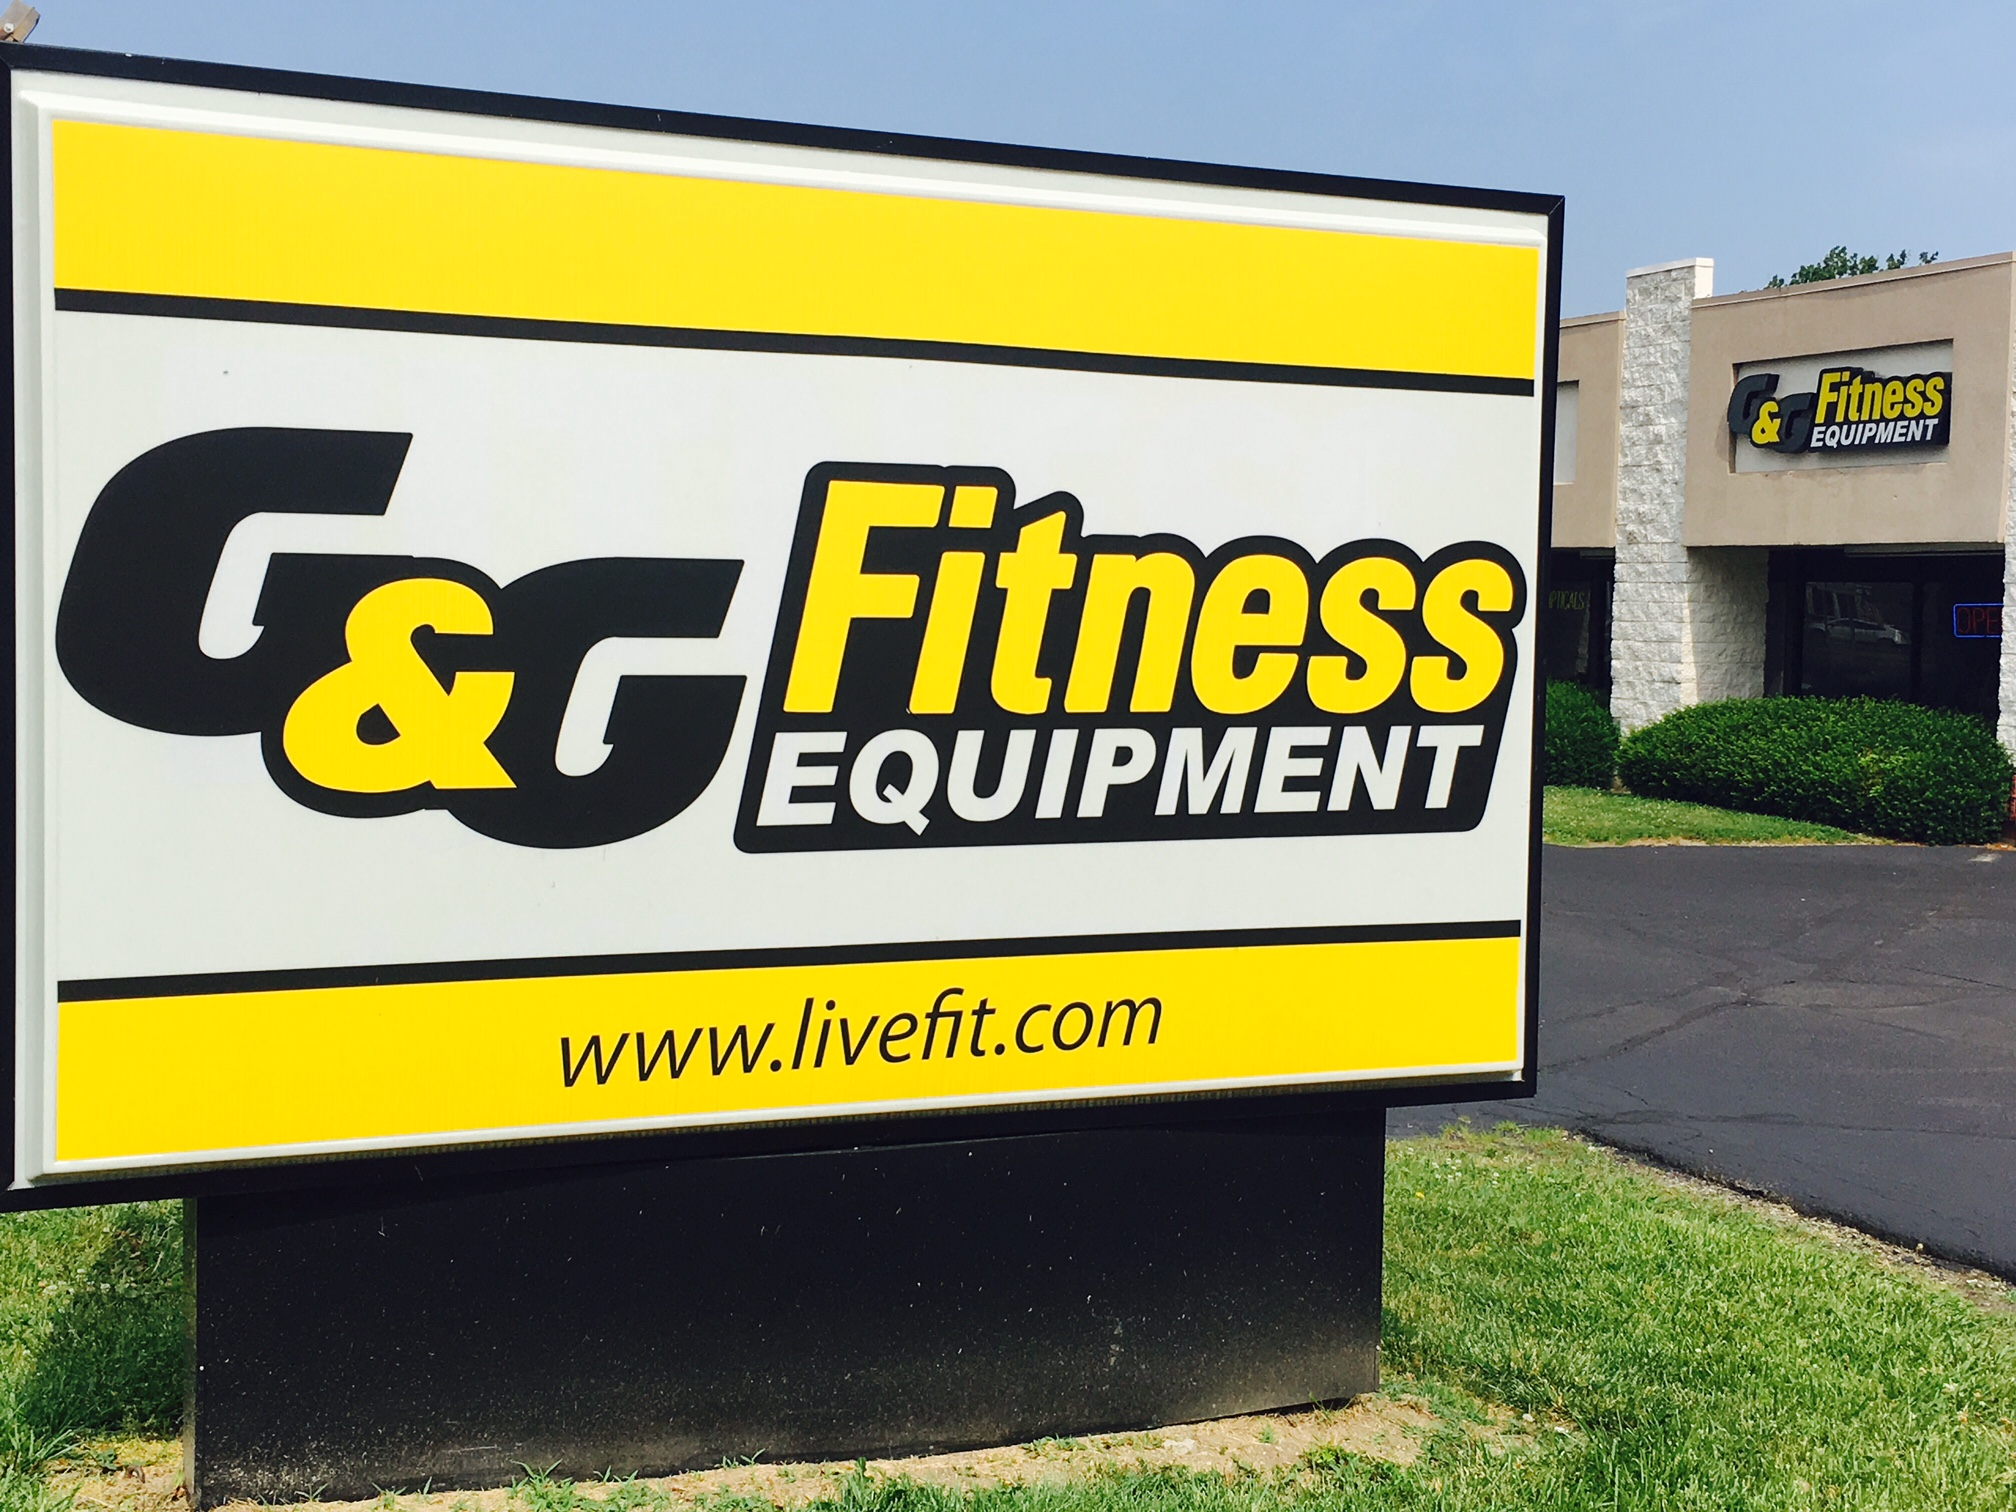 G&G Fitness Equipment - Dayton image 0